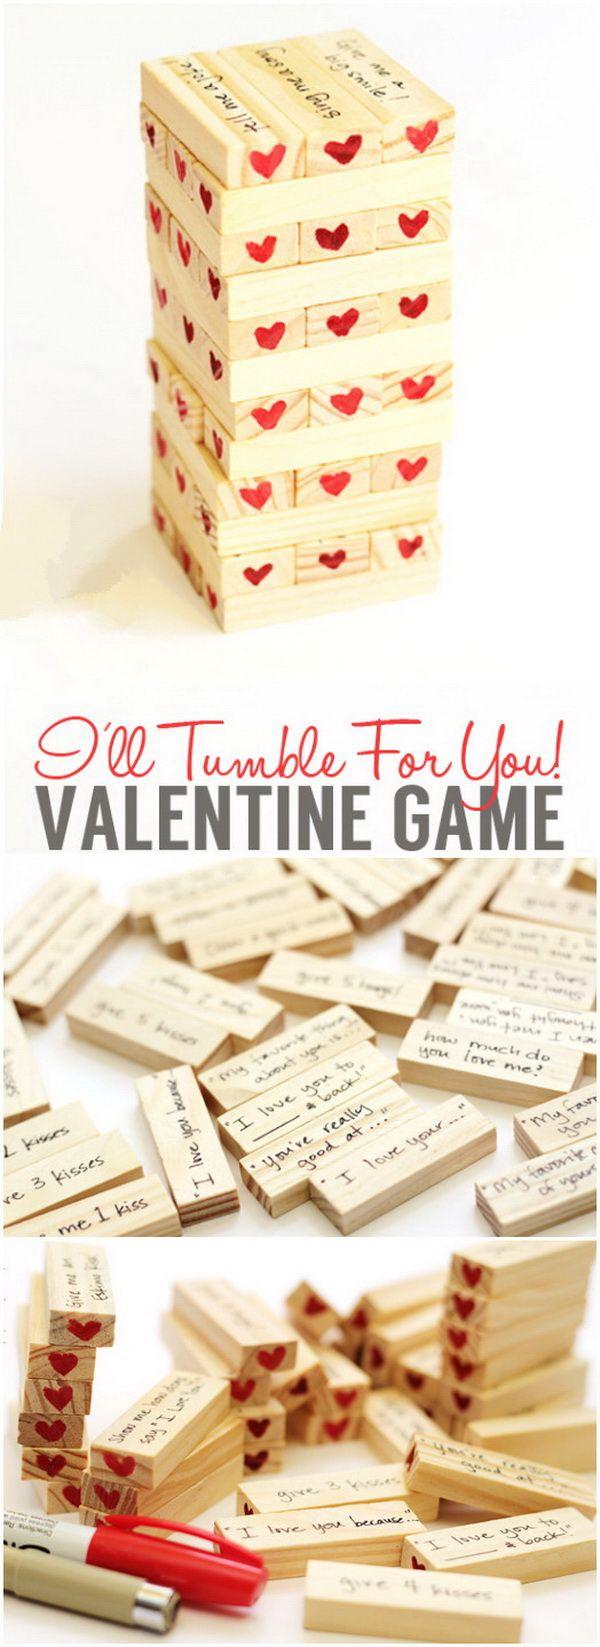 Easy DIY Valentine's Day Gifts for Boyfriend | Gift, DIY Valentine and Craft